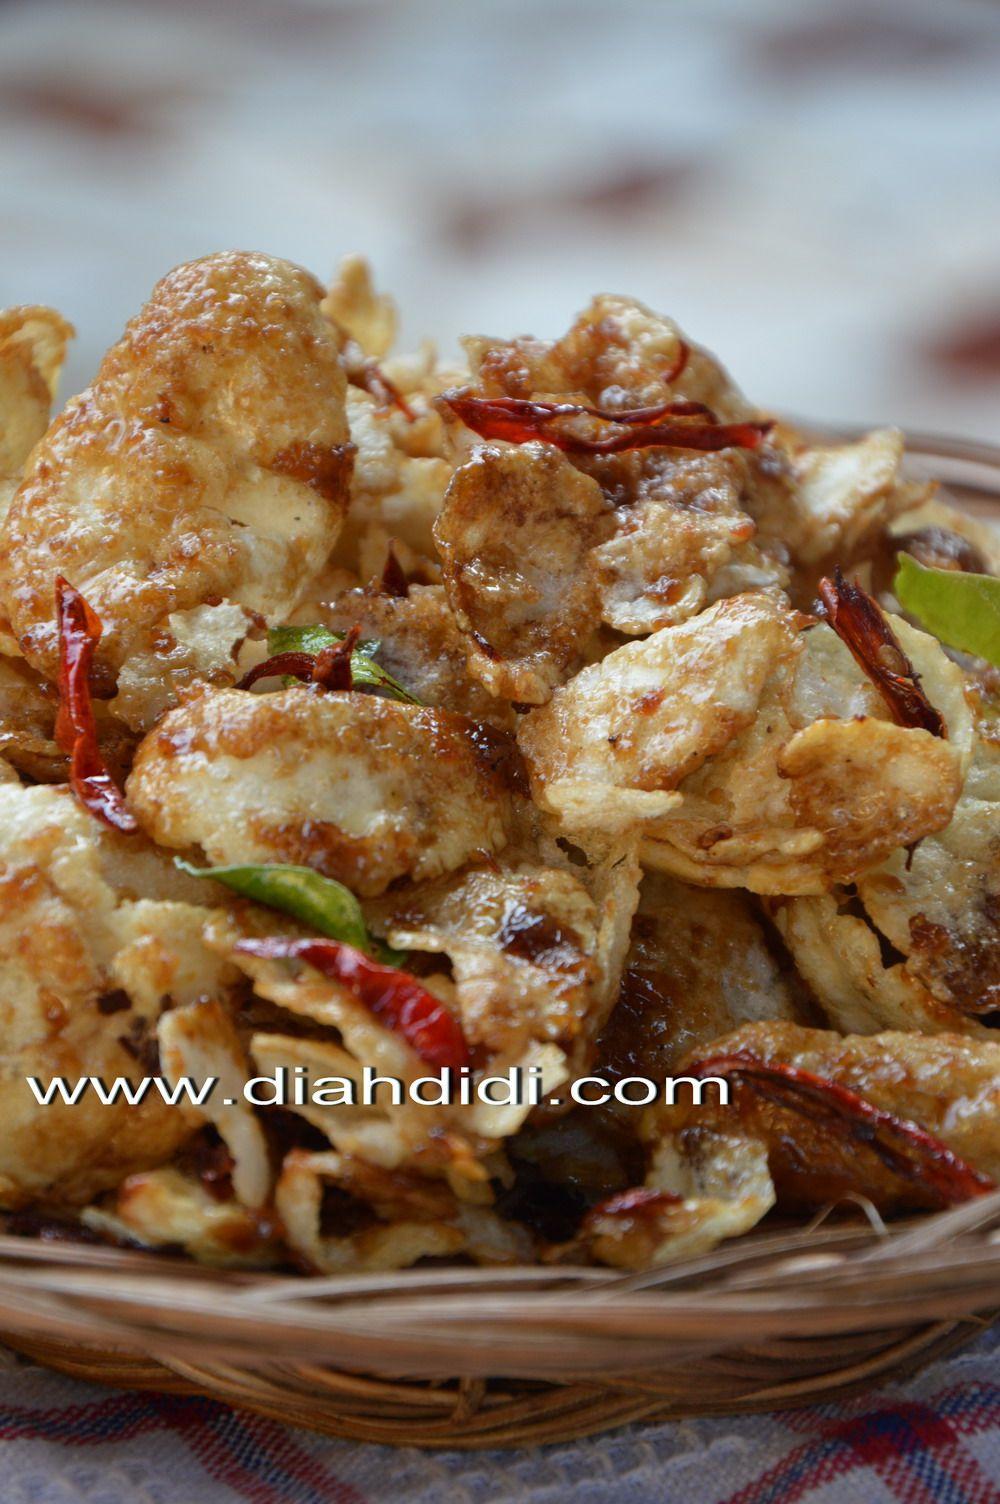 Diah Didi S Kitchen Emping Melinjo Pedas Manis Masakan Masakan Indonesia Resep Masakan Indonesia